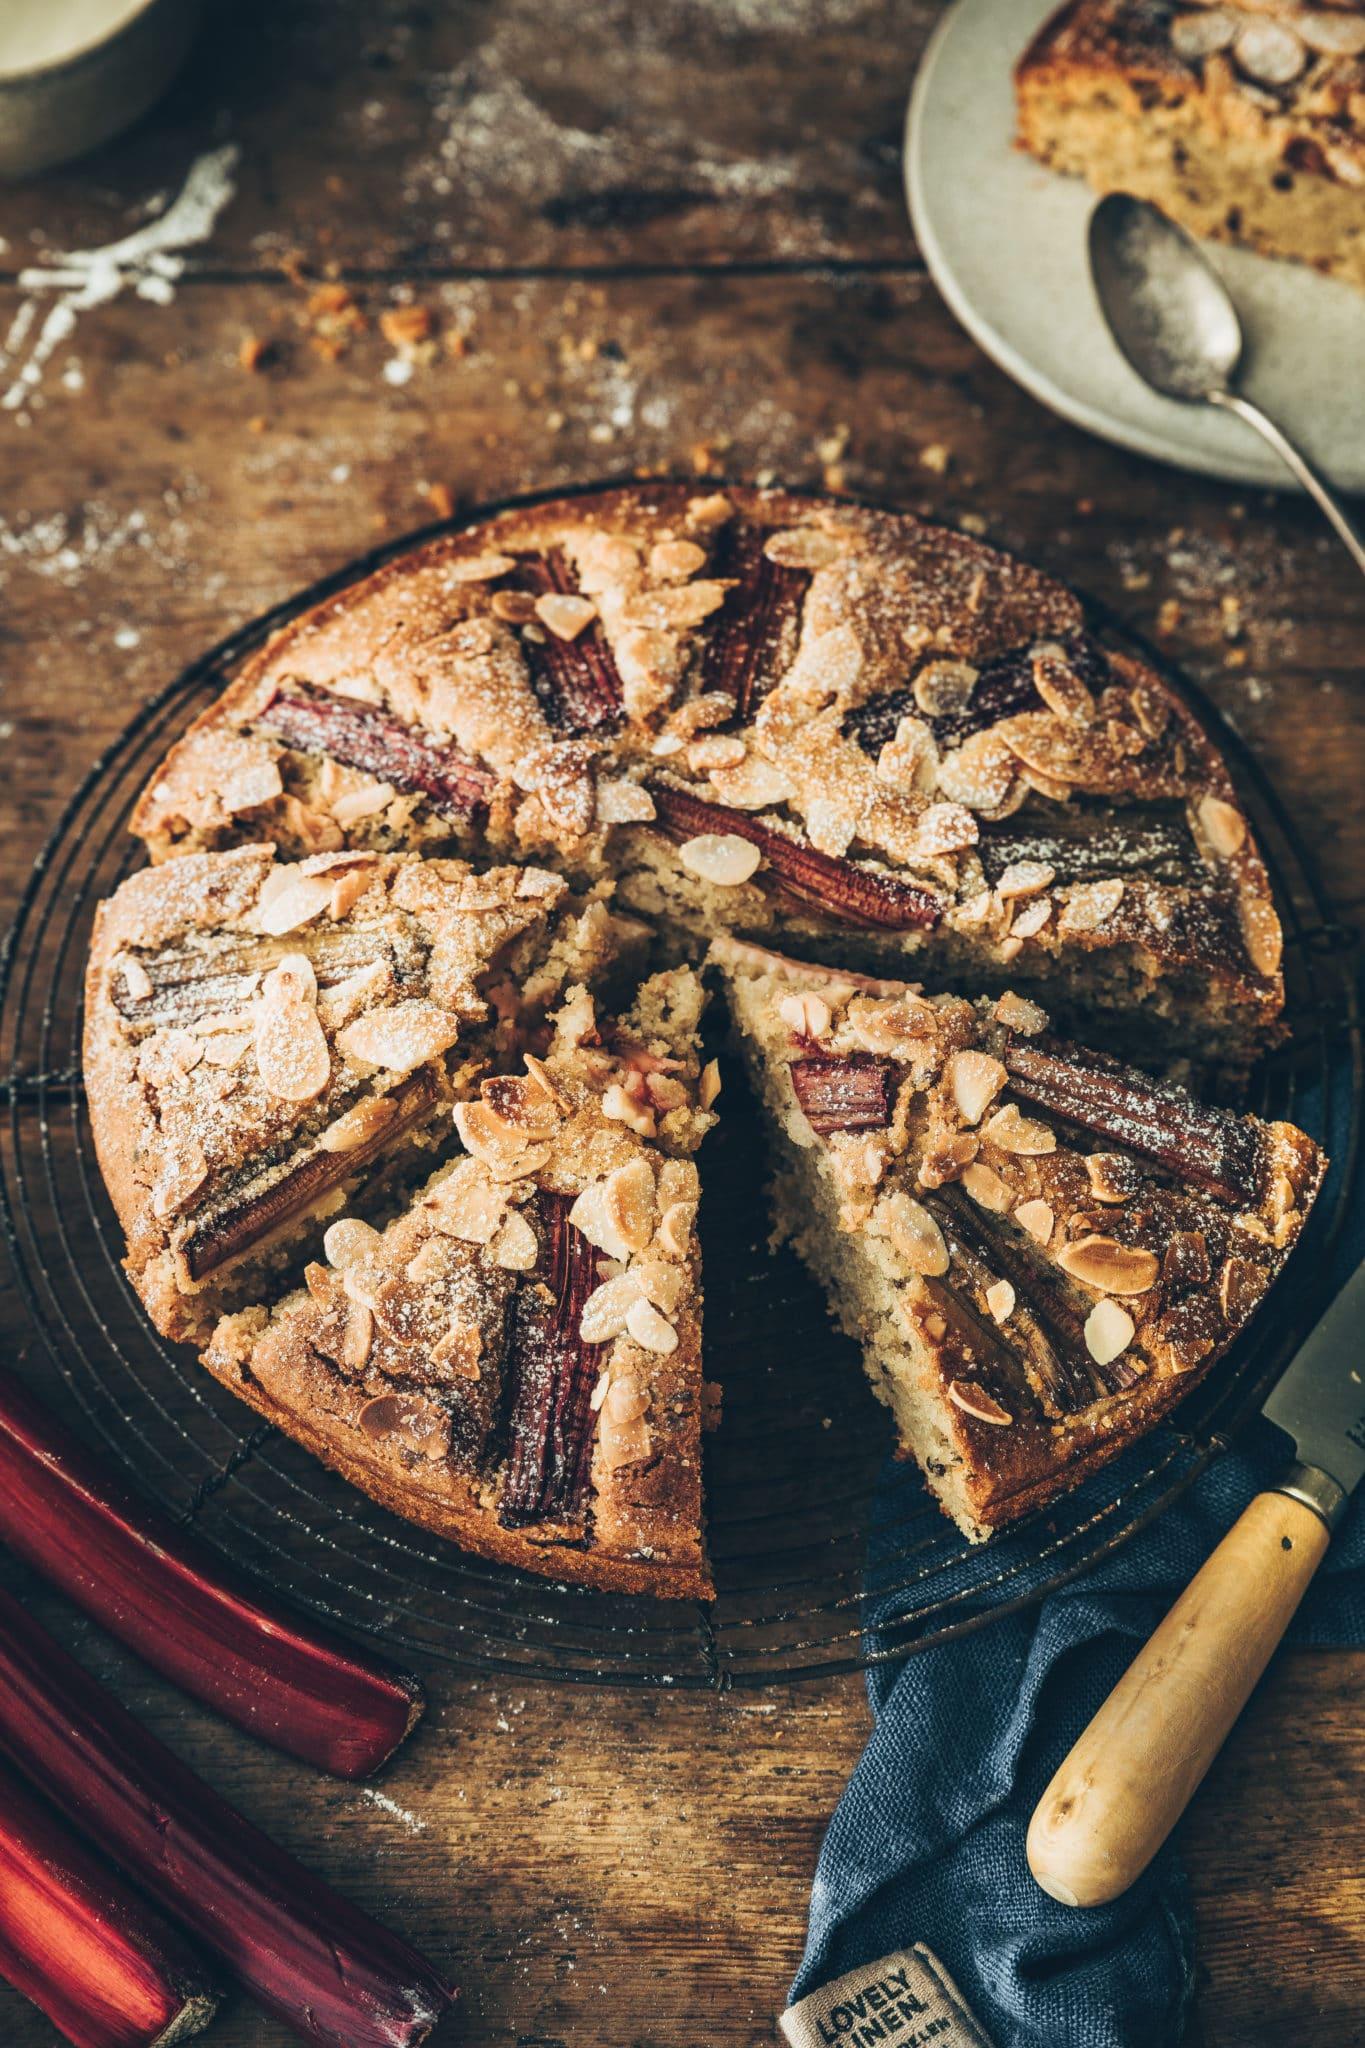 Gâteau amandes et rhubarbe - megandcook Mégane Ardérighi